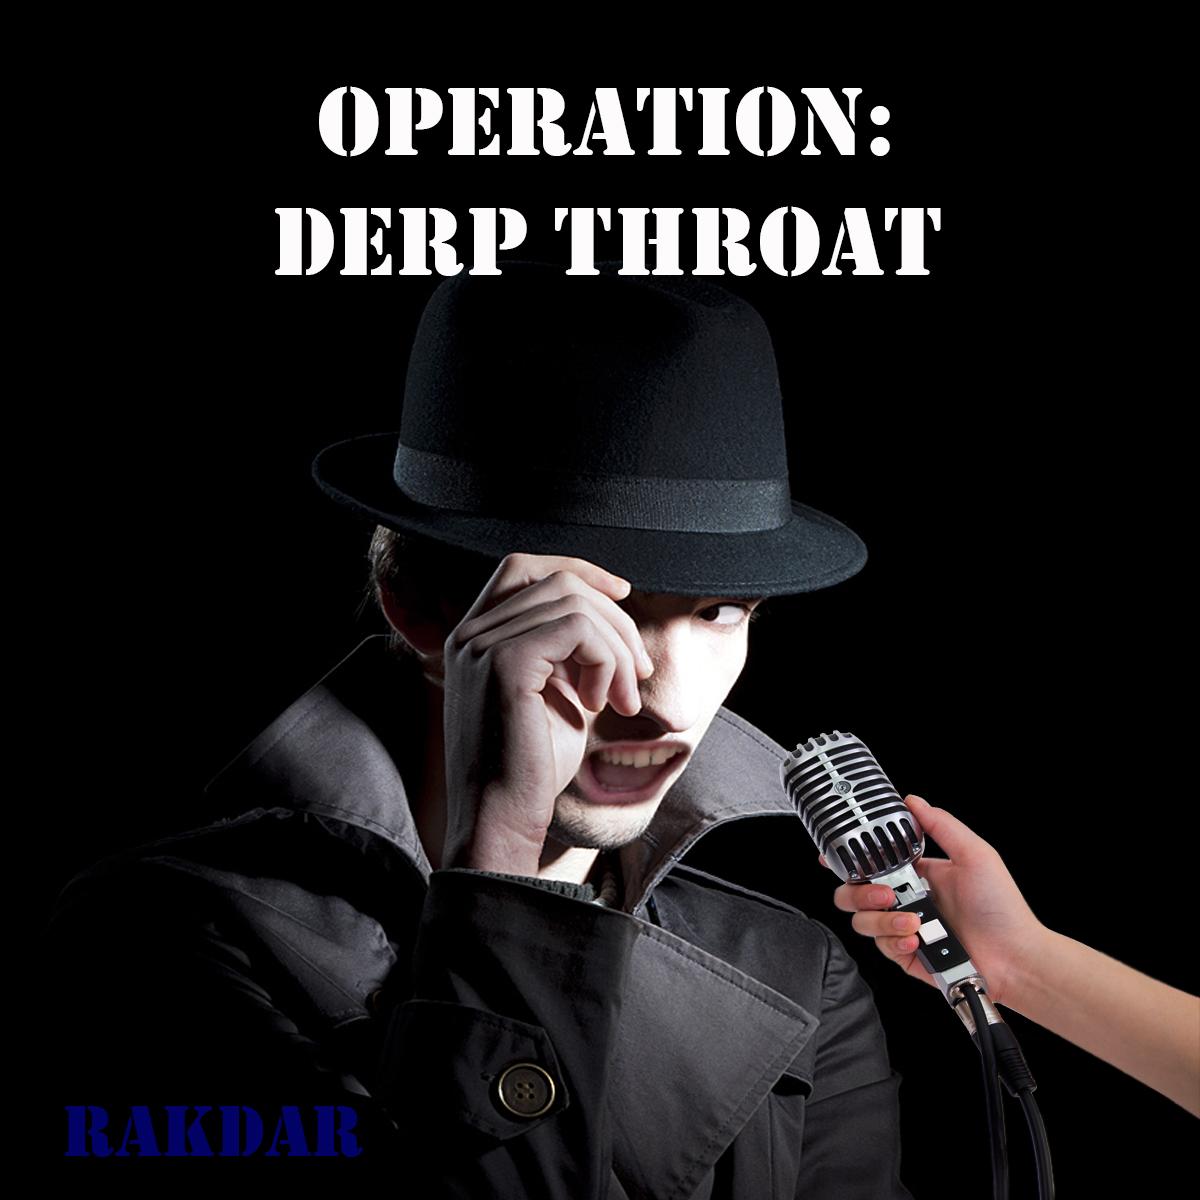 derp throat